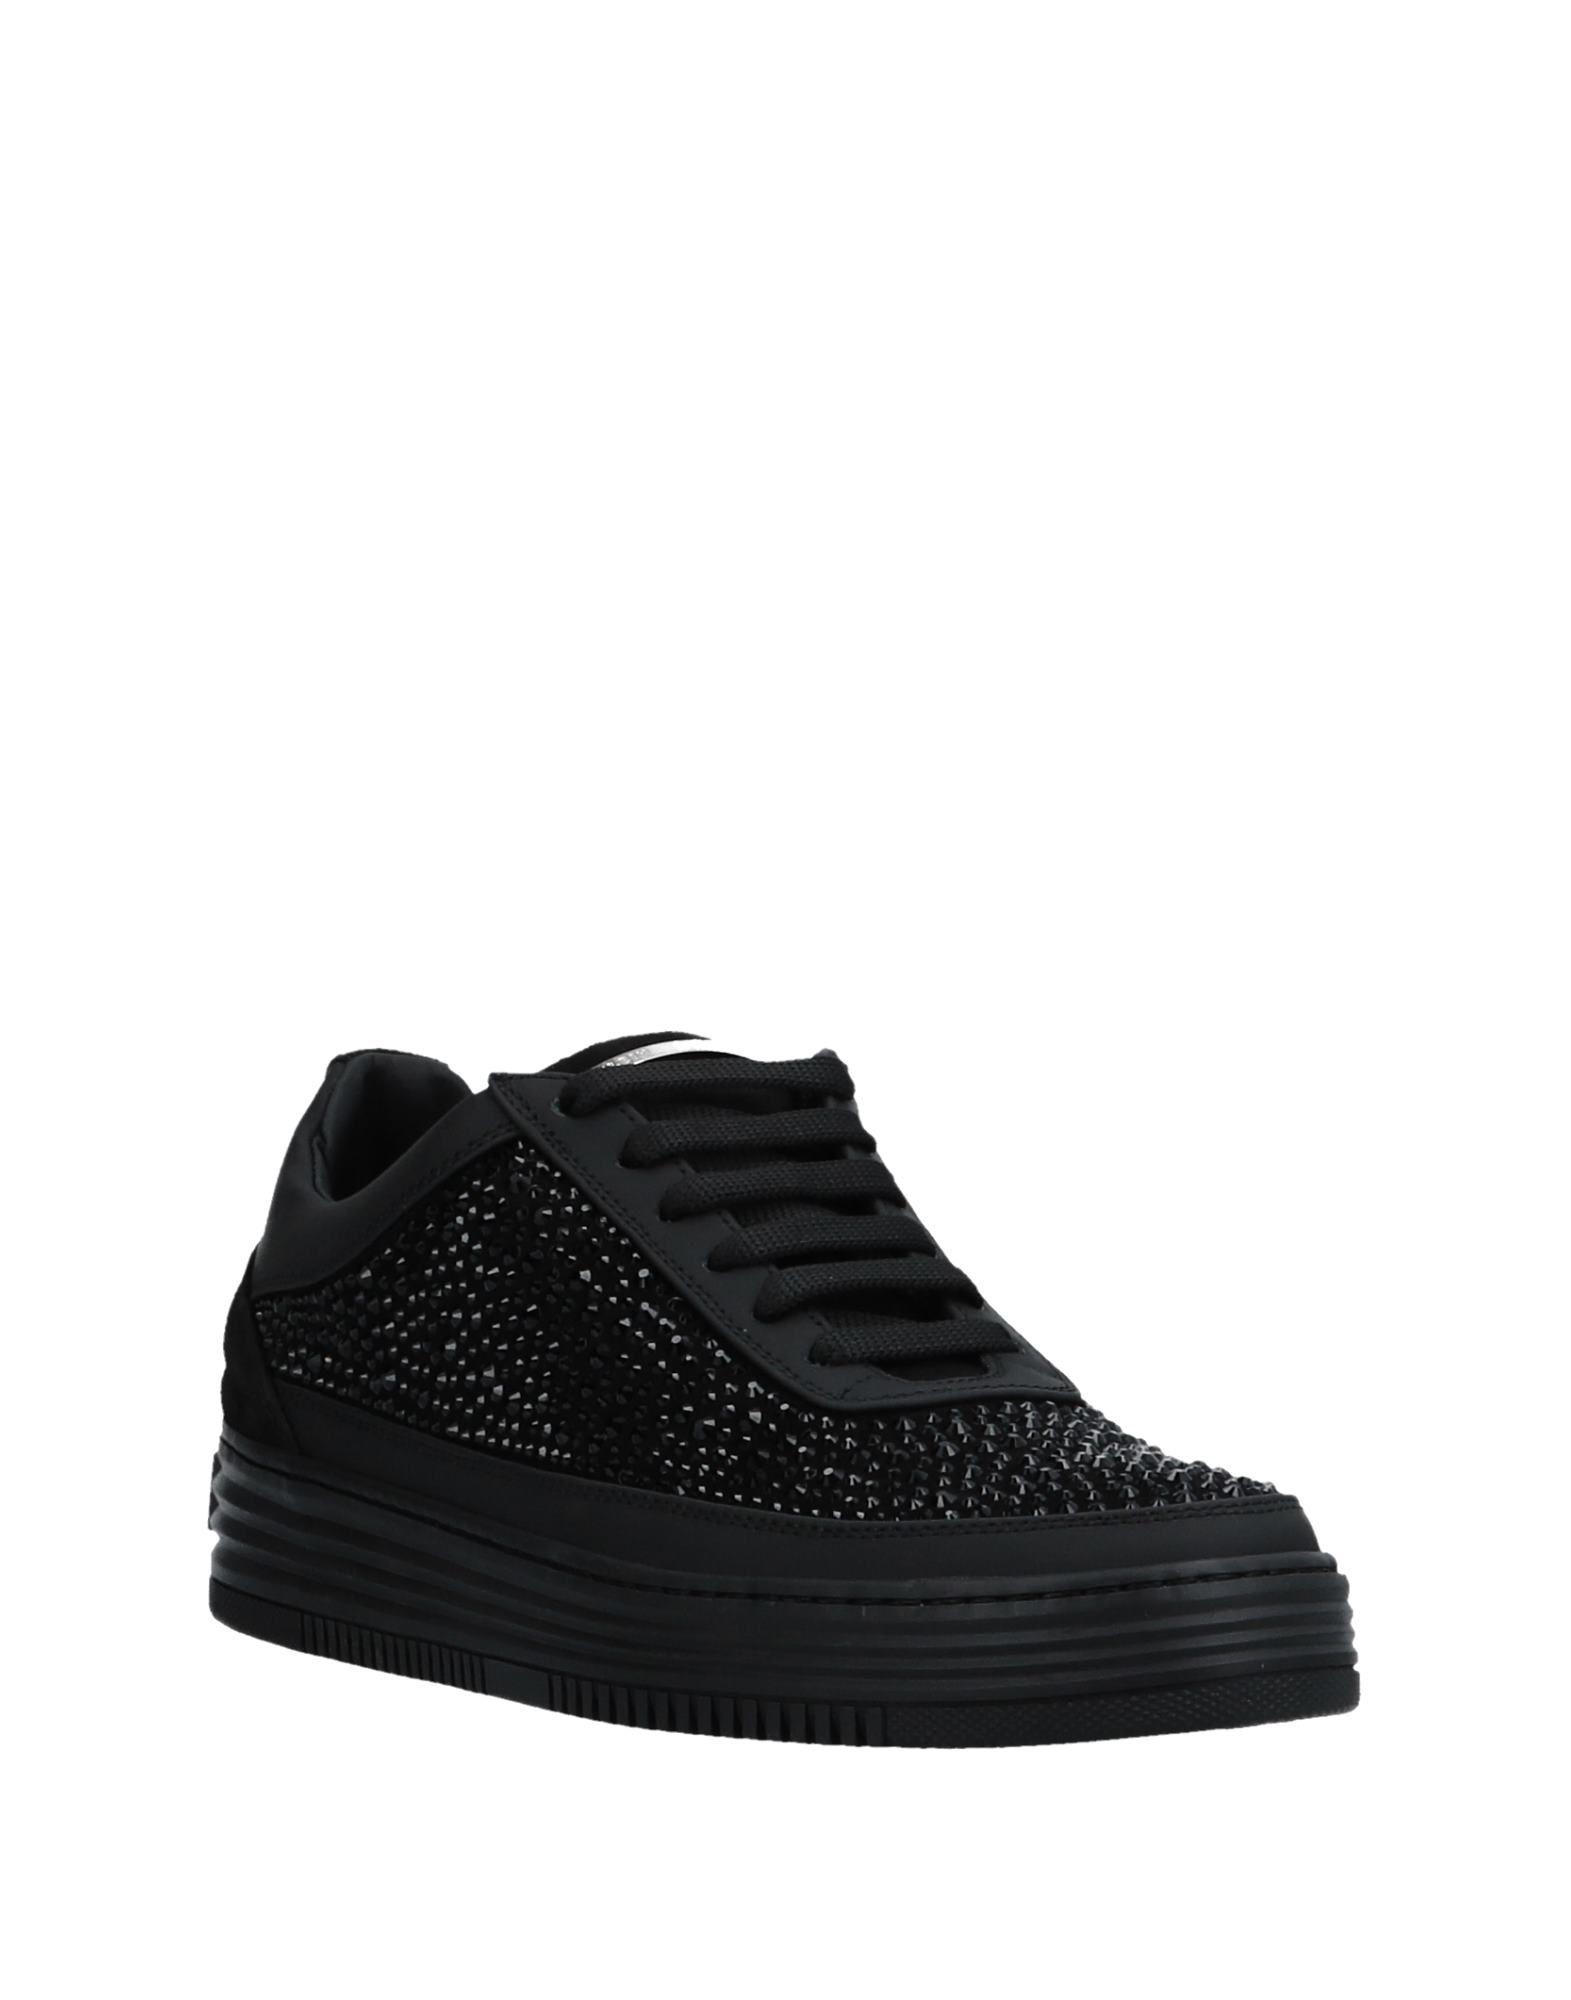 Philipp Philipp Philipp Plein Sneakers Herren  11511437NV c991b8